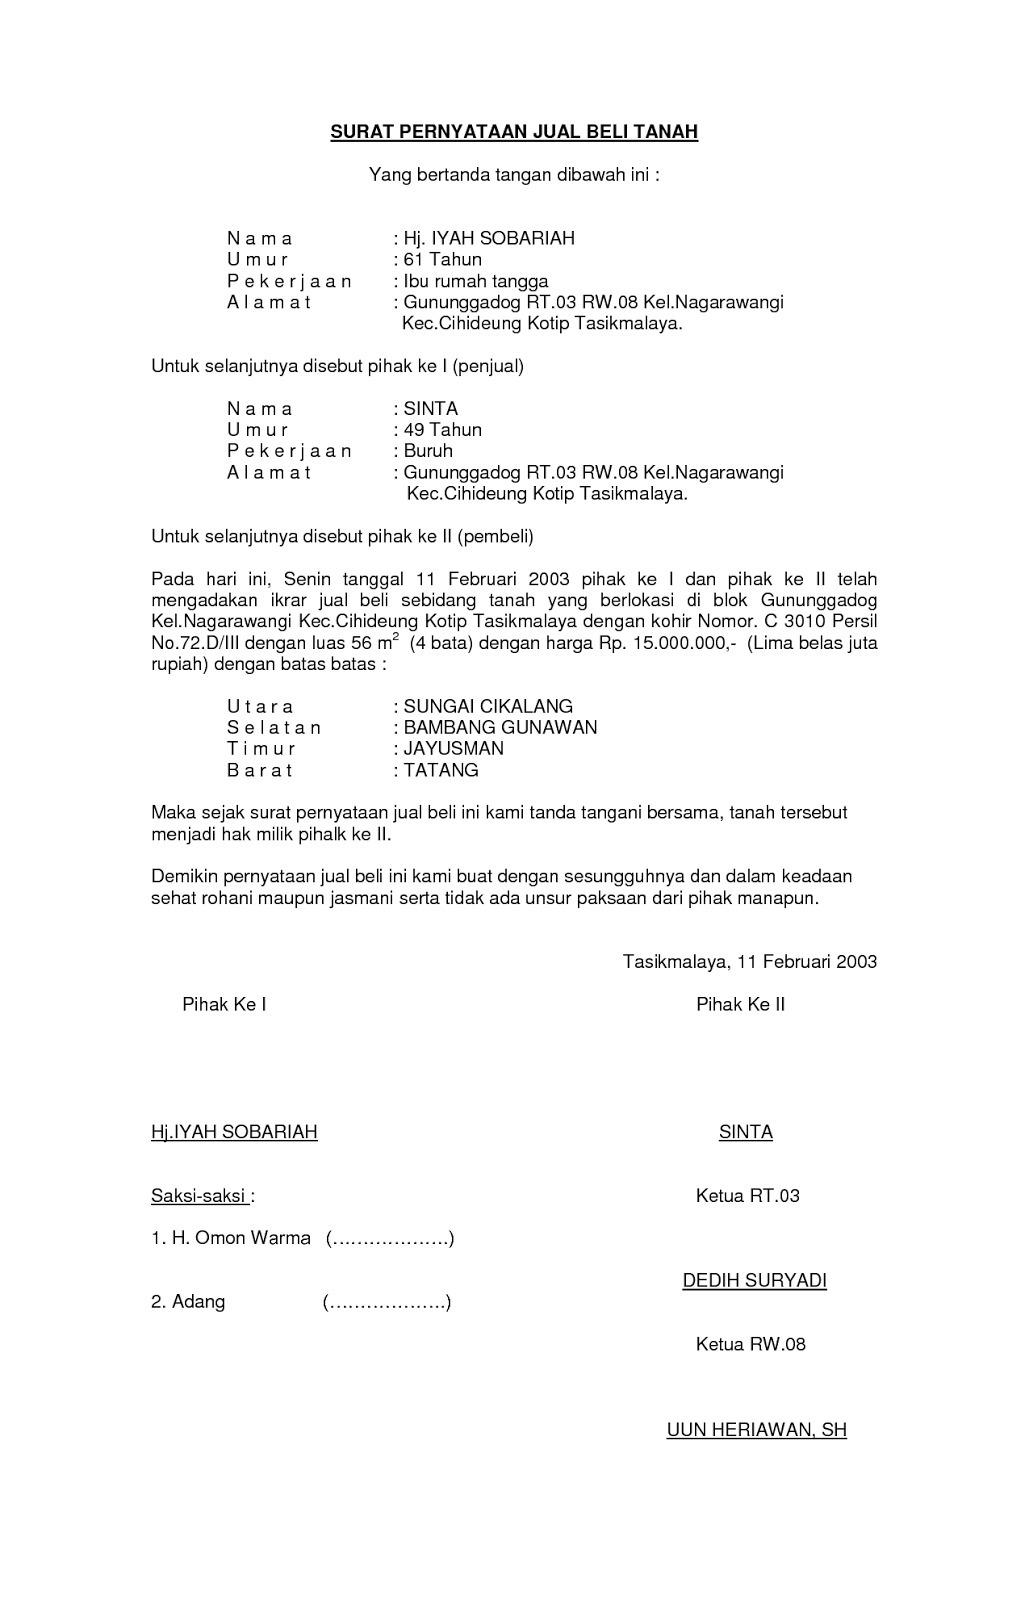 Contoh Surat Perjanjian Jual Beli Brainlycoid